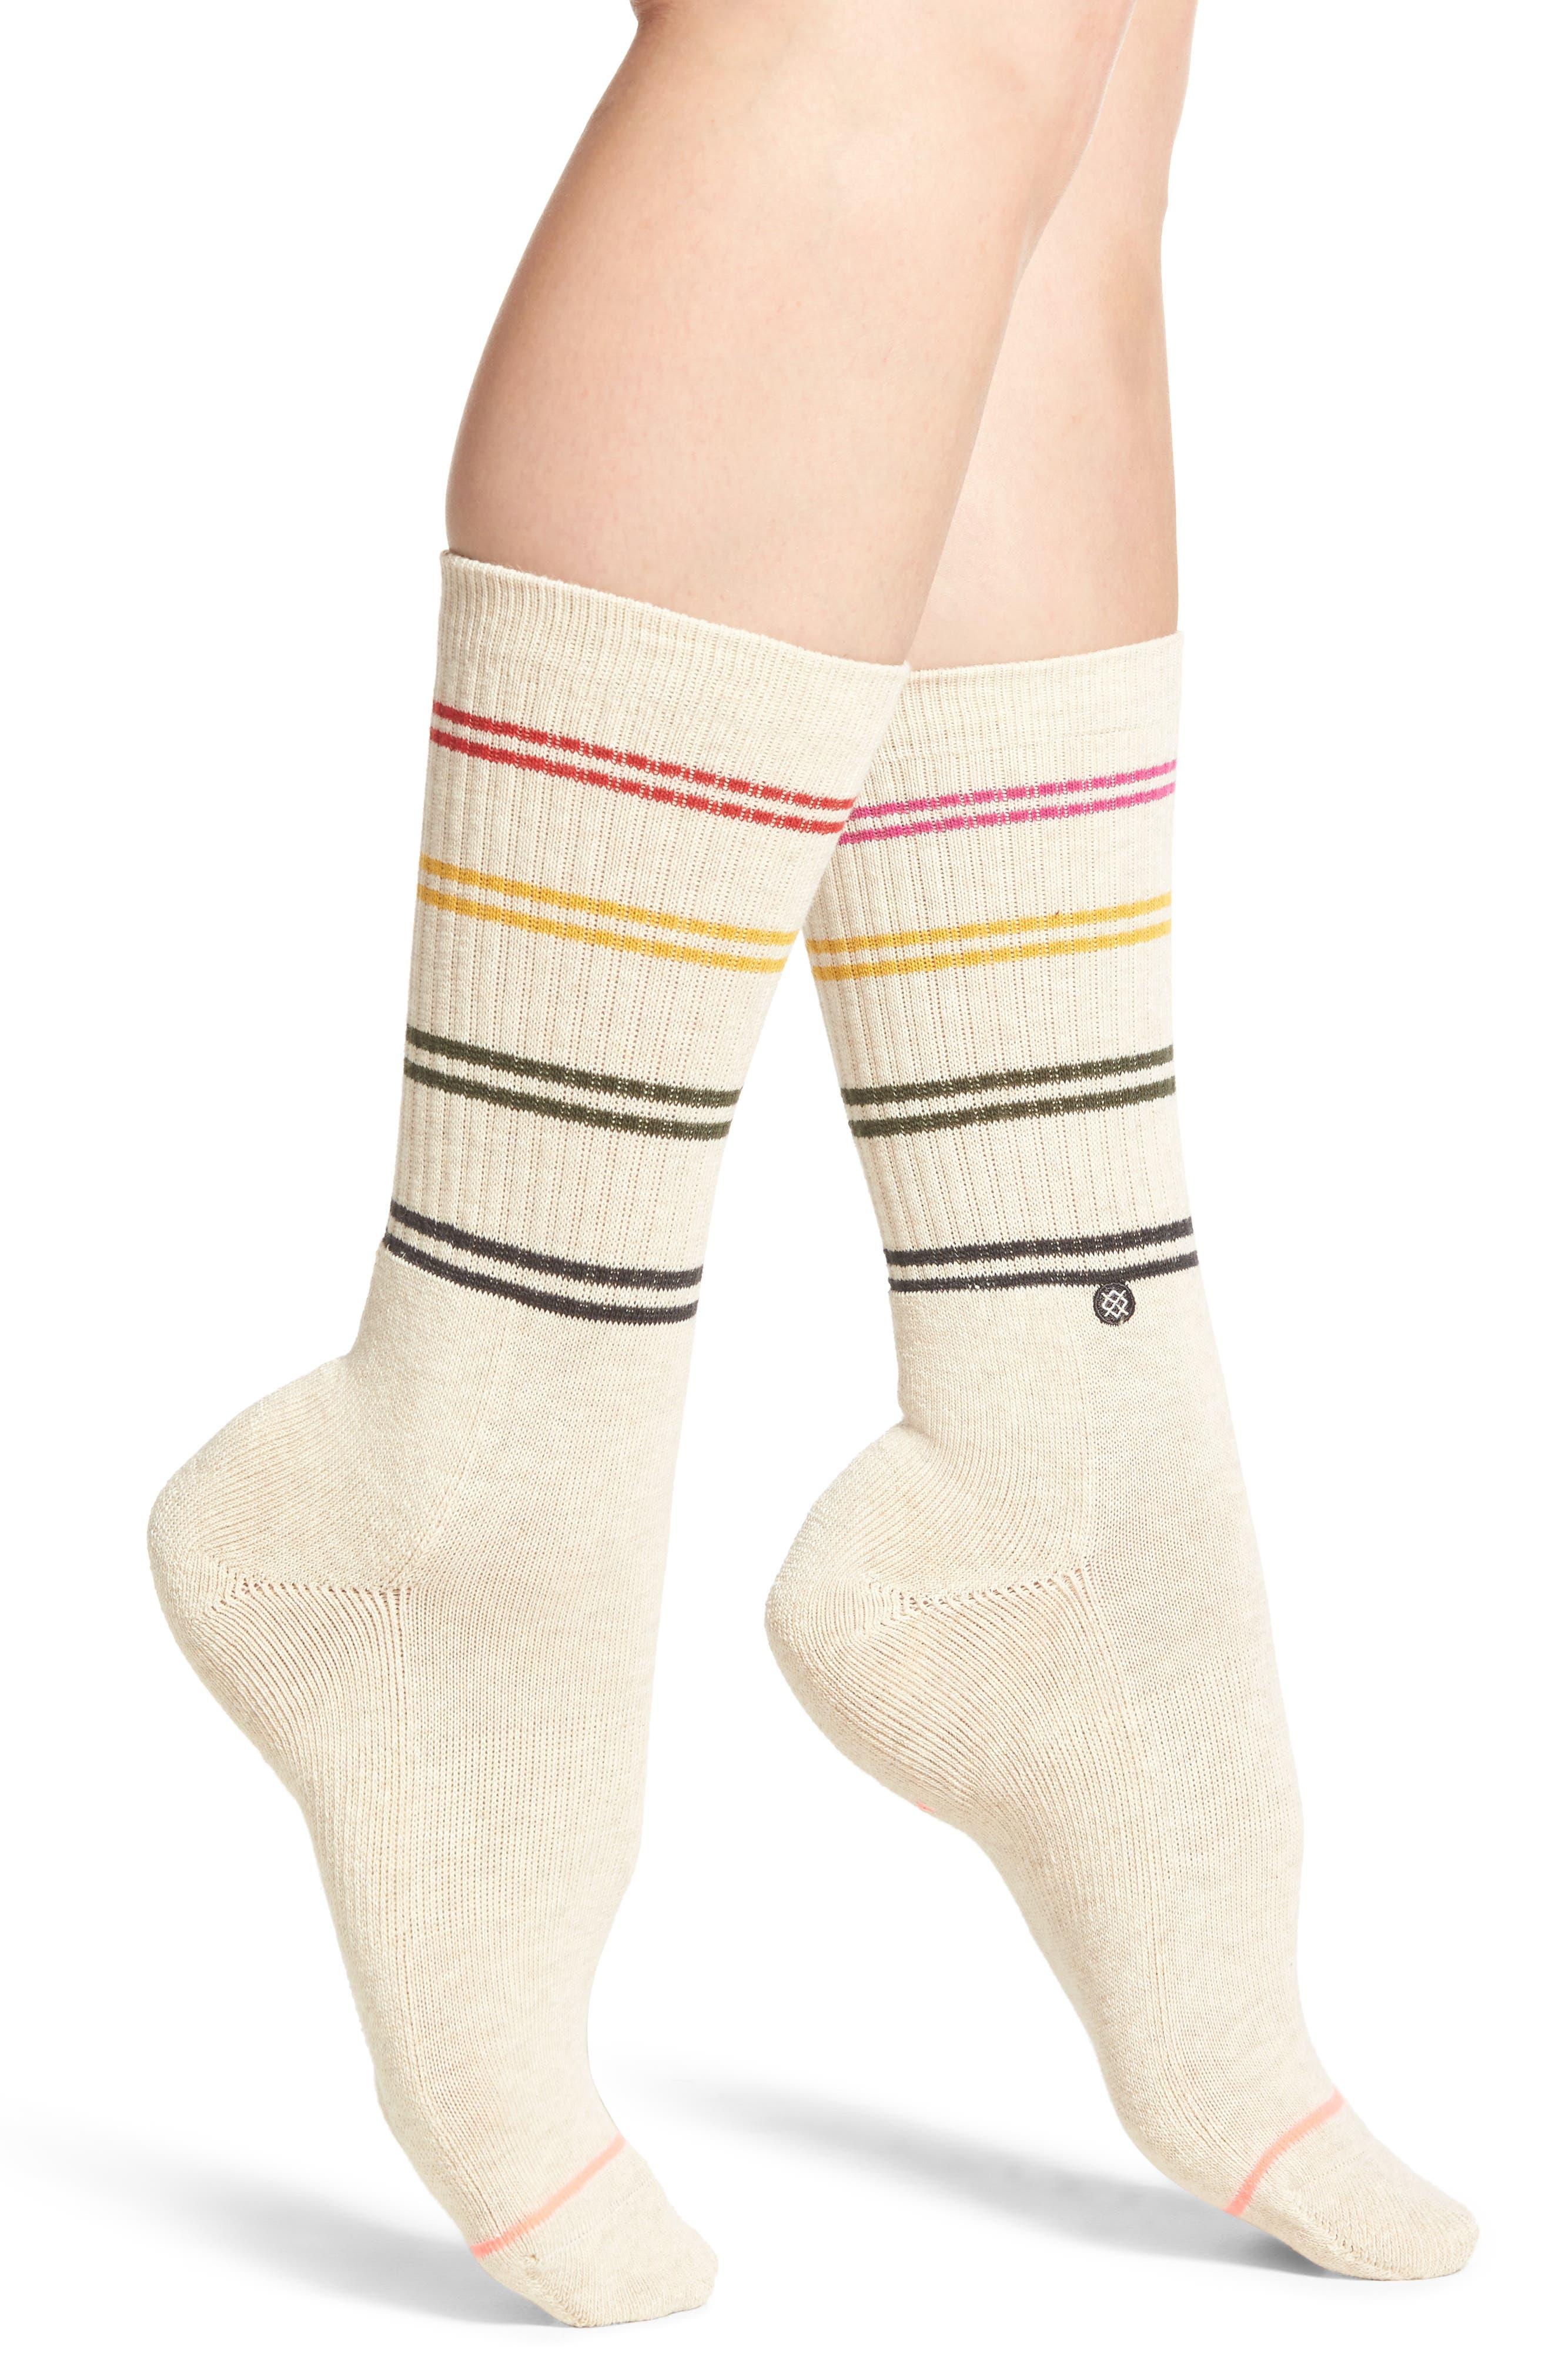 Main Image - Stance Jah Crew Socks